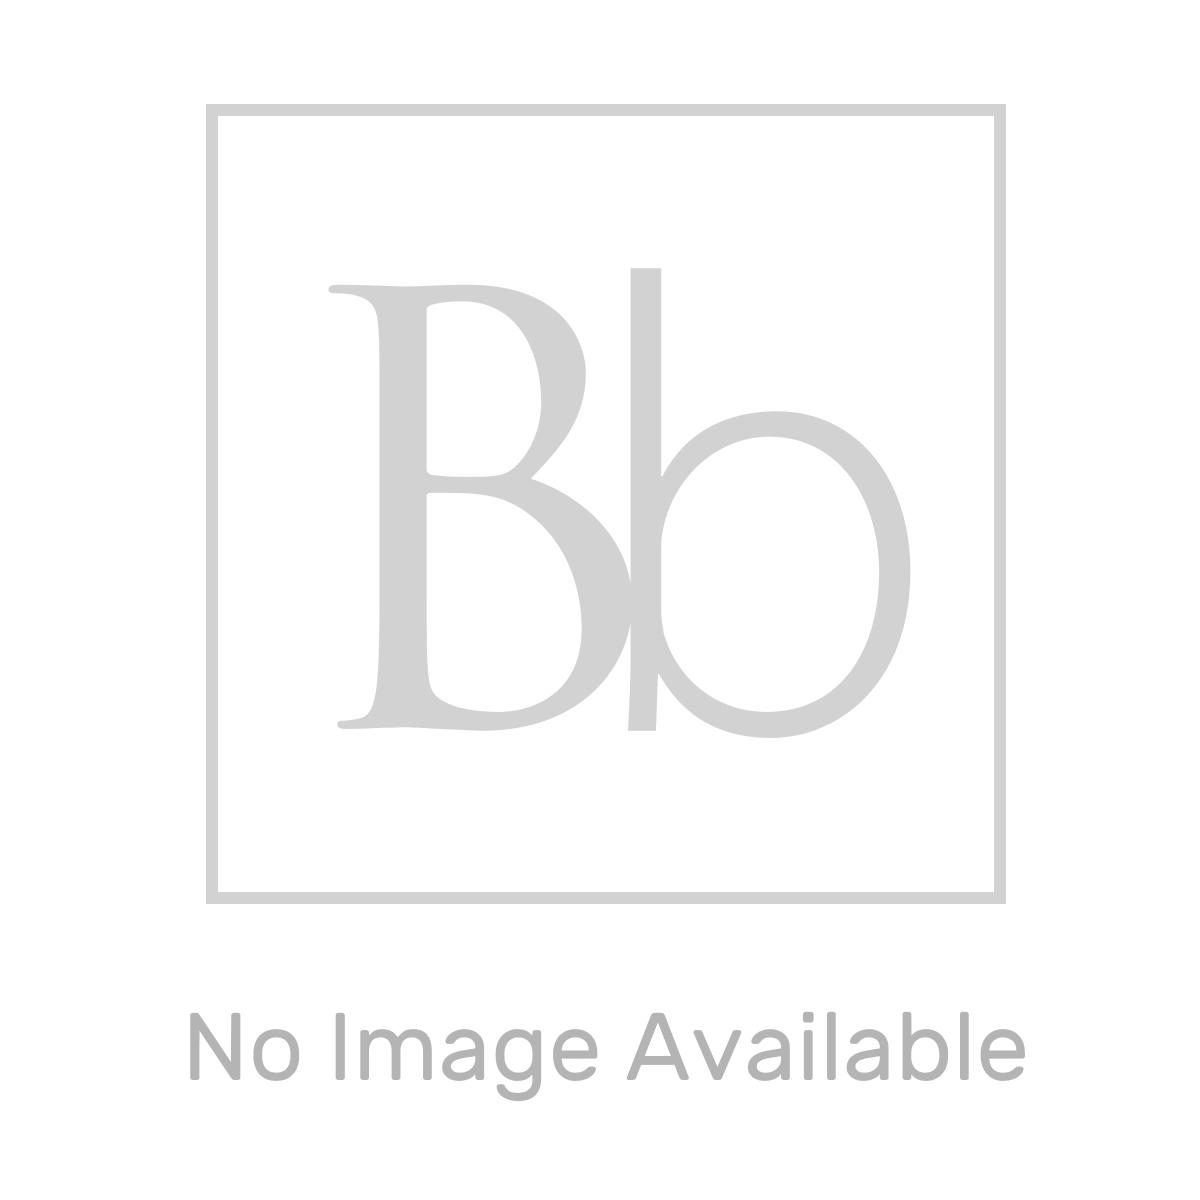 Aquadart Venturi 6 Single Bath Shower Screen